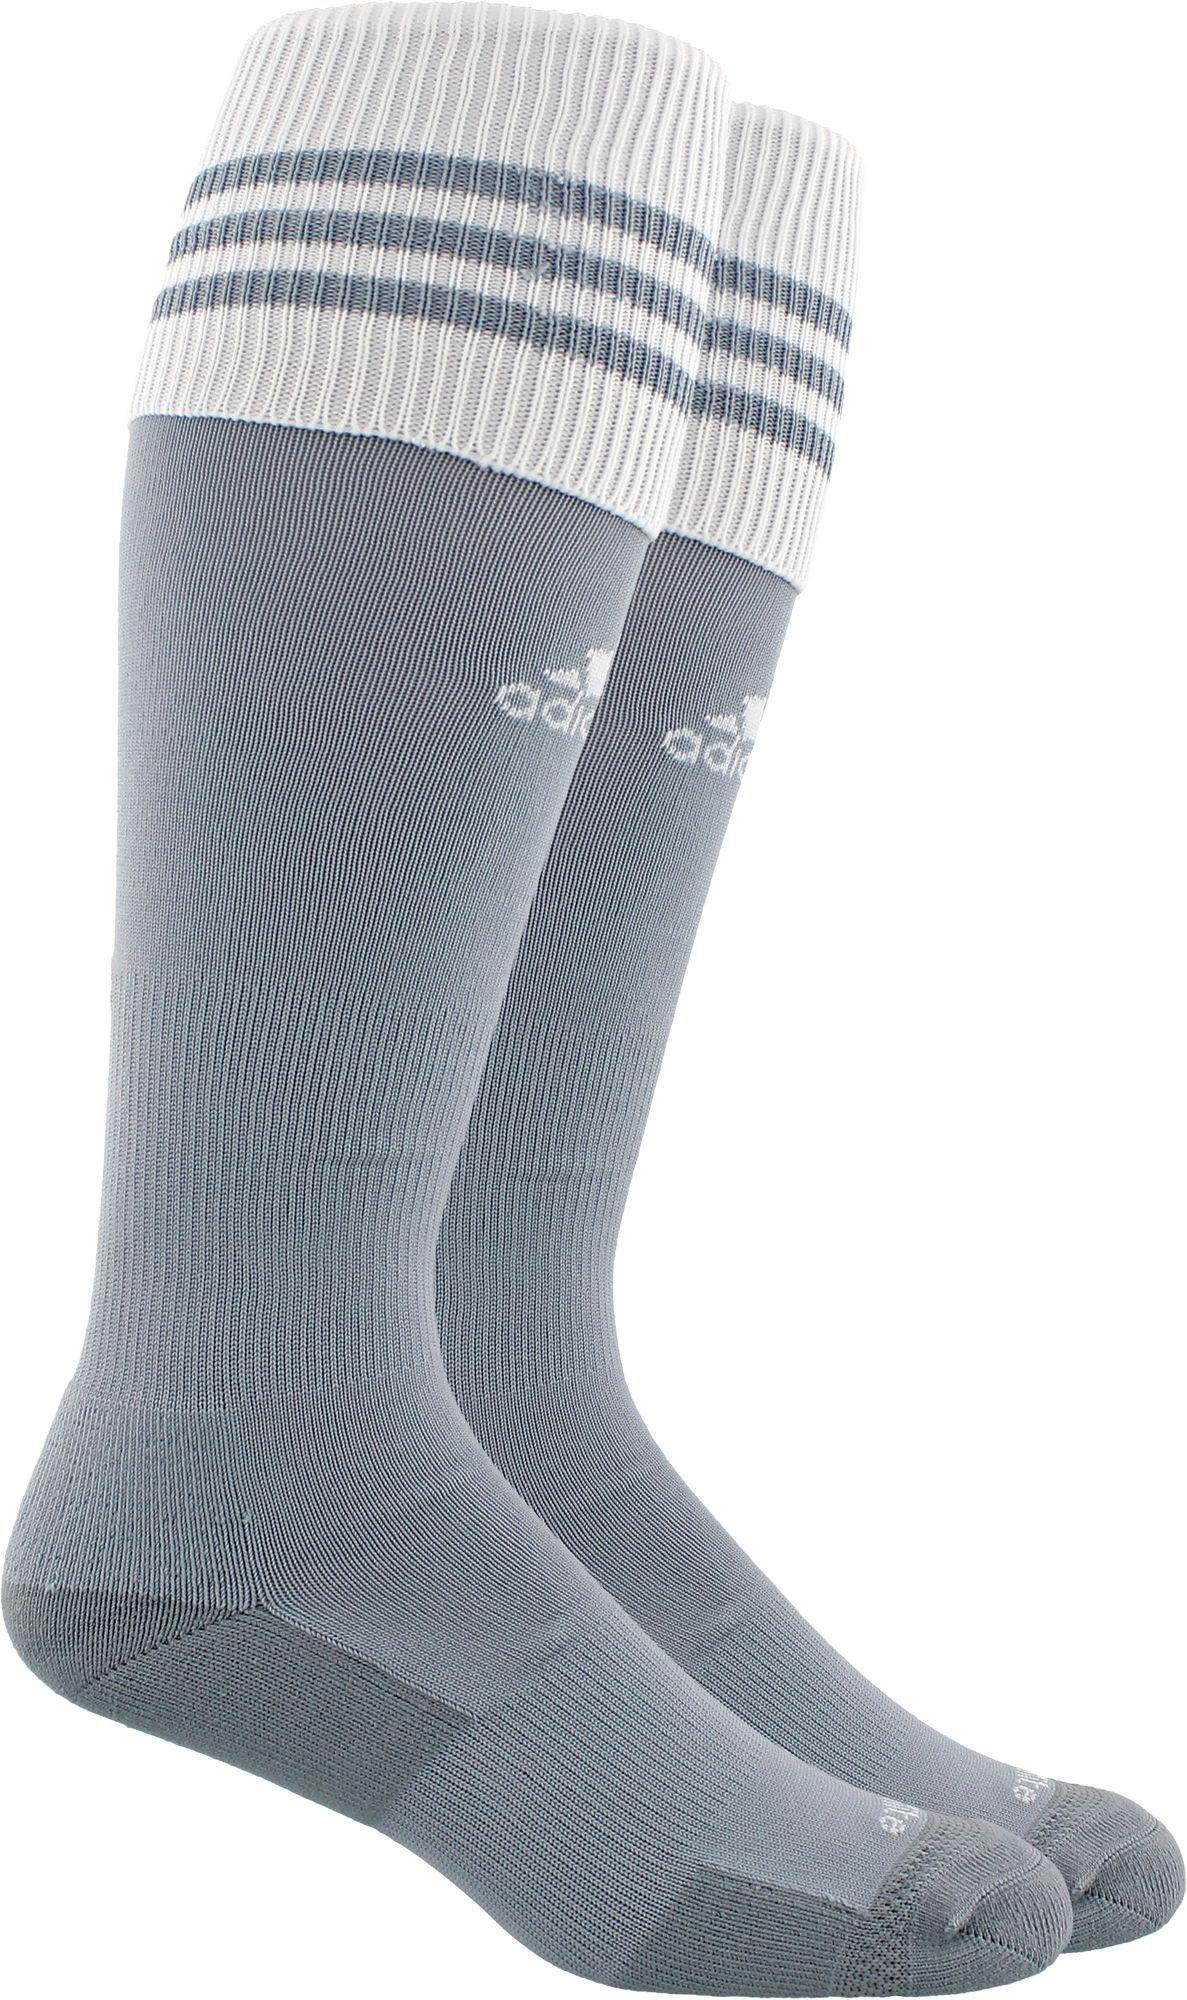 af793655e adidas Copa Zone Cushion II Soccer Socks   Products   Soccer socks ...